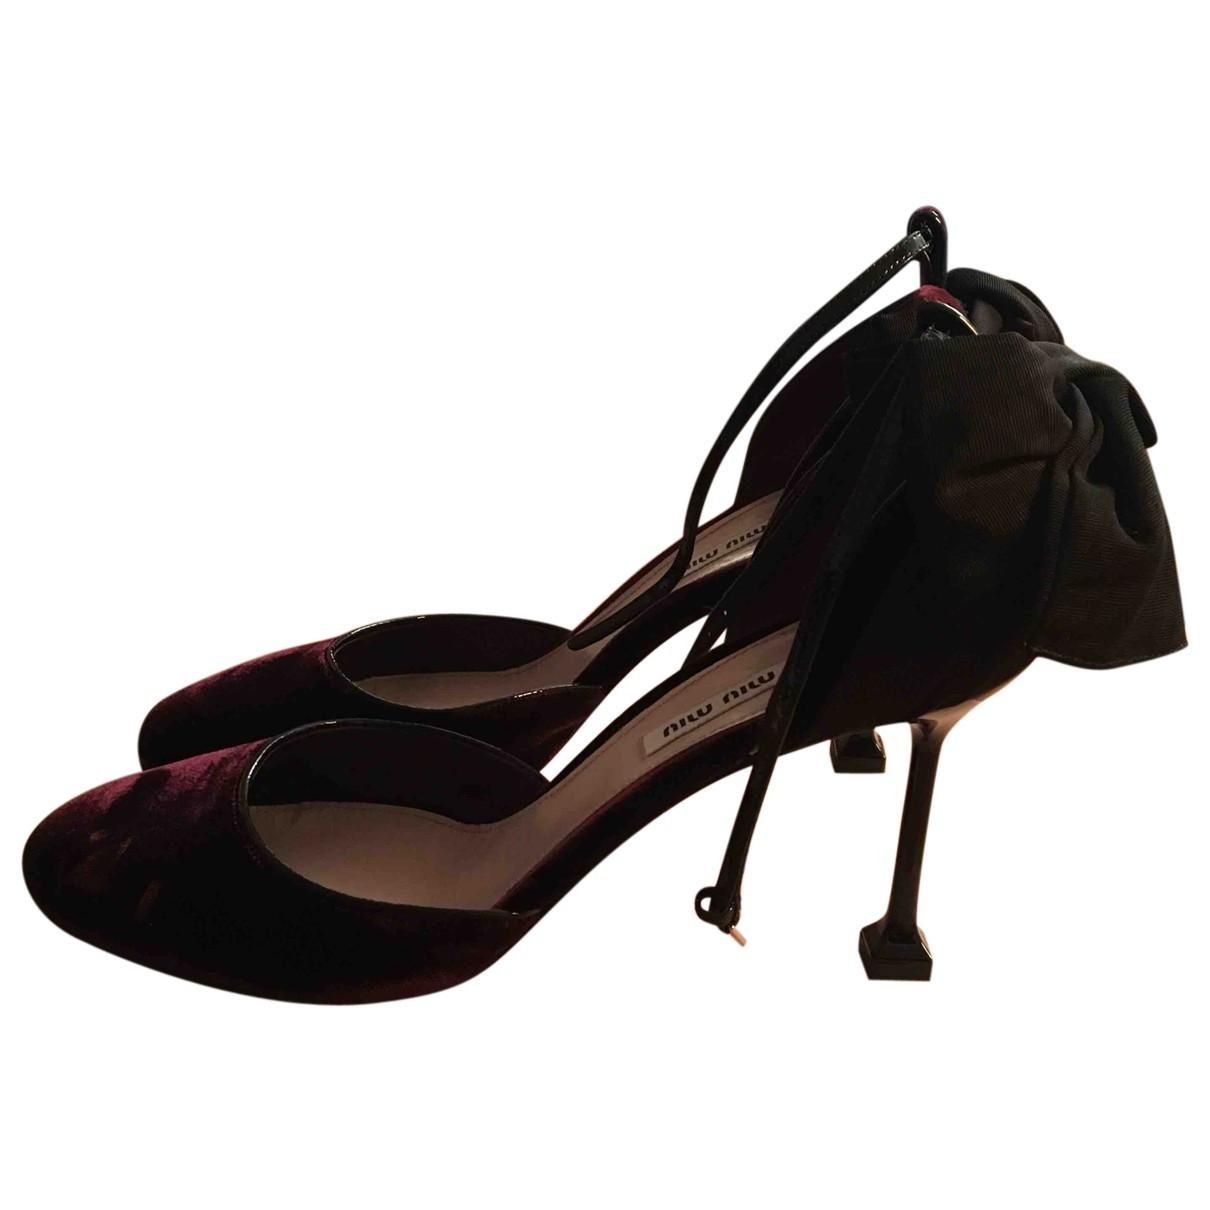 Miu Miu \N Burgundy Velvet Heels for Women 40 EU